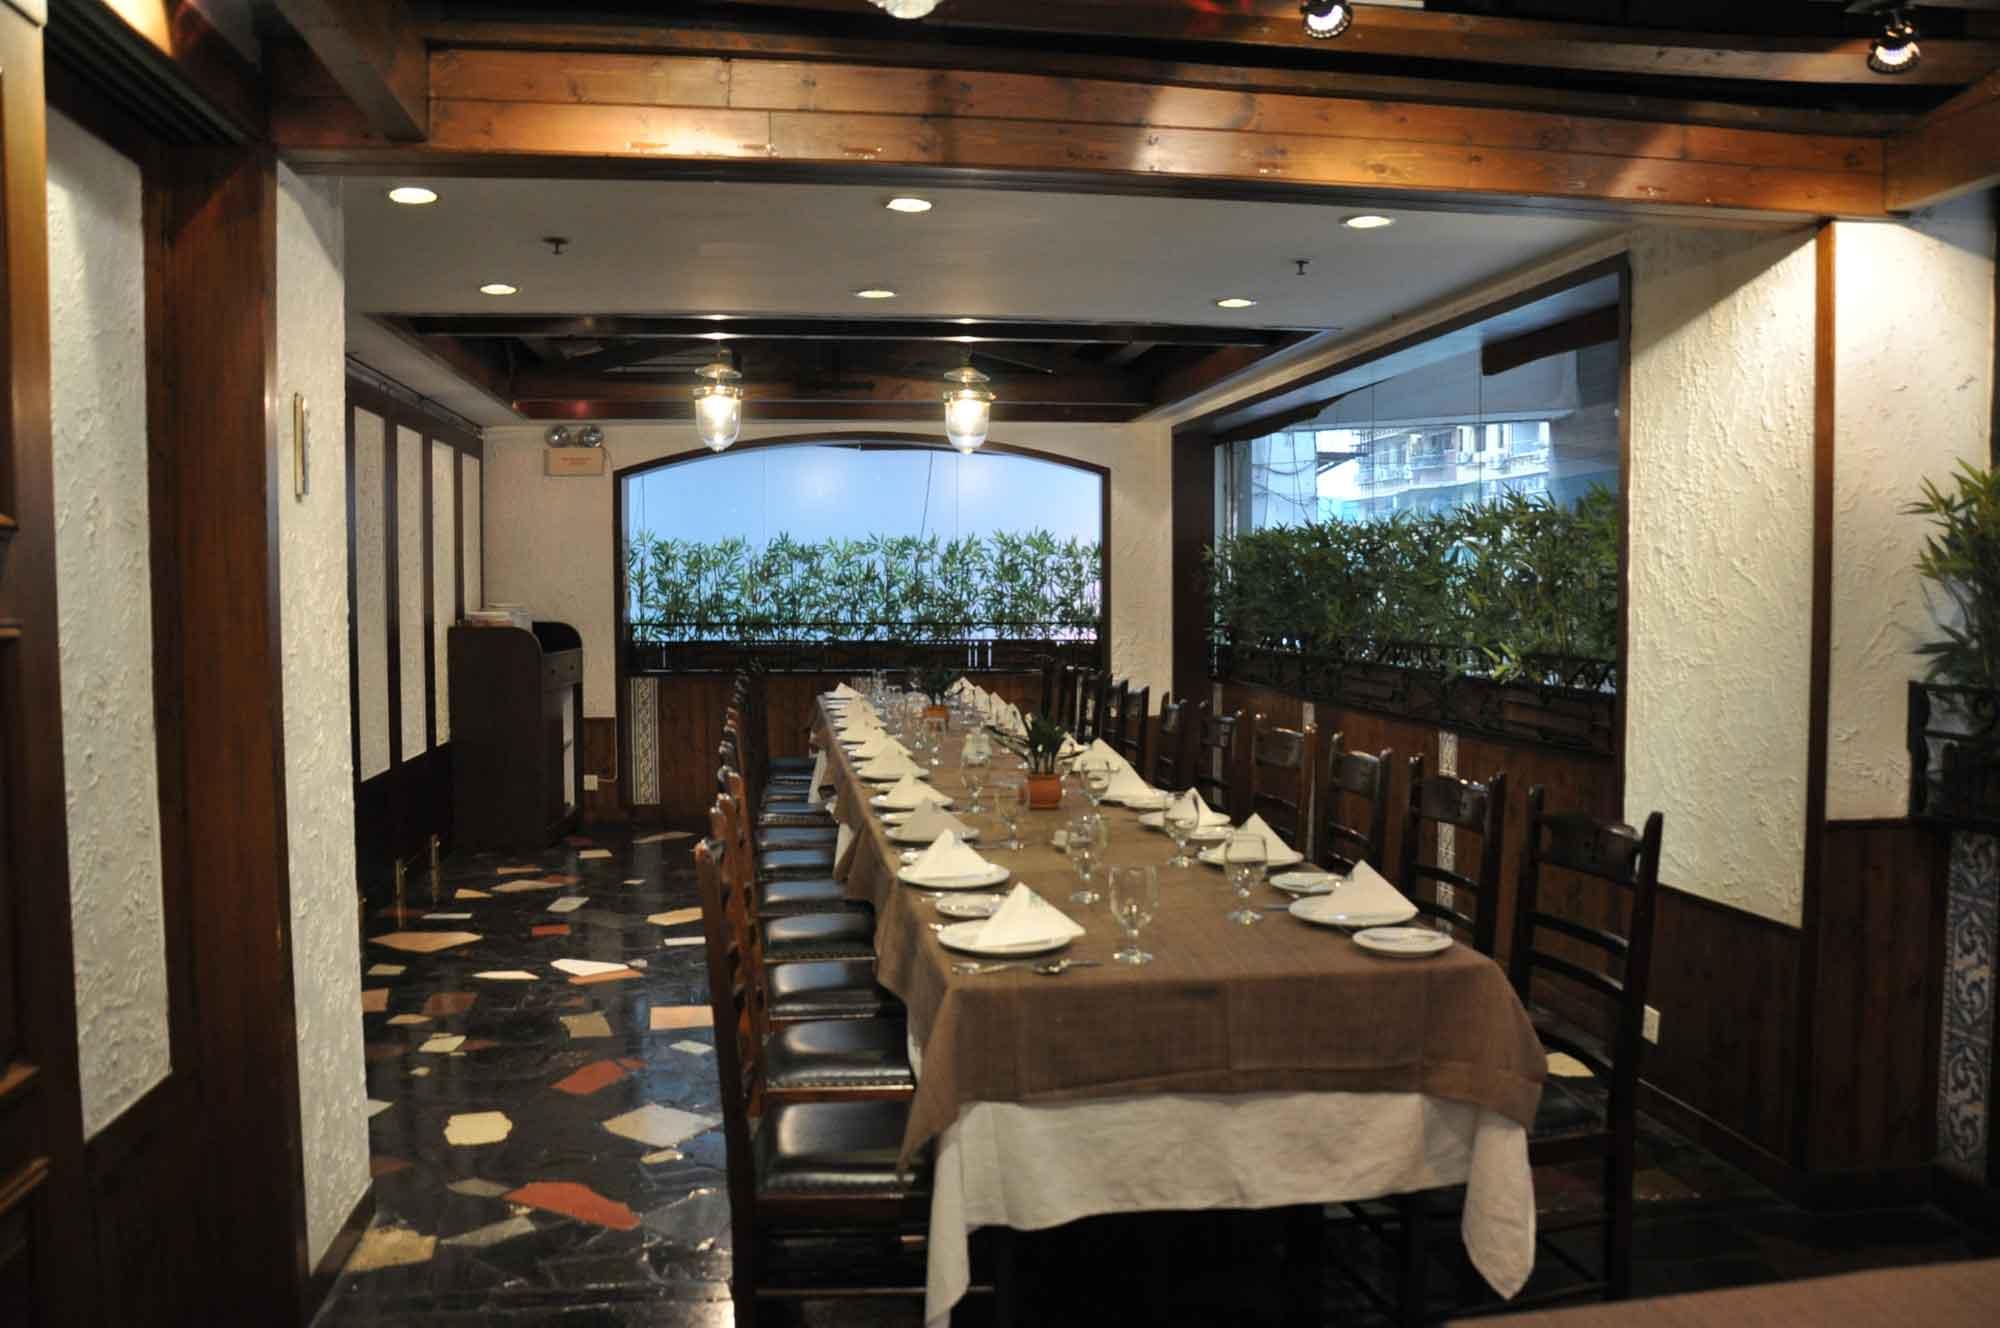 Litoral Macau upstairs seating